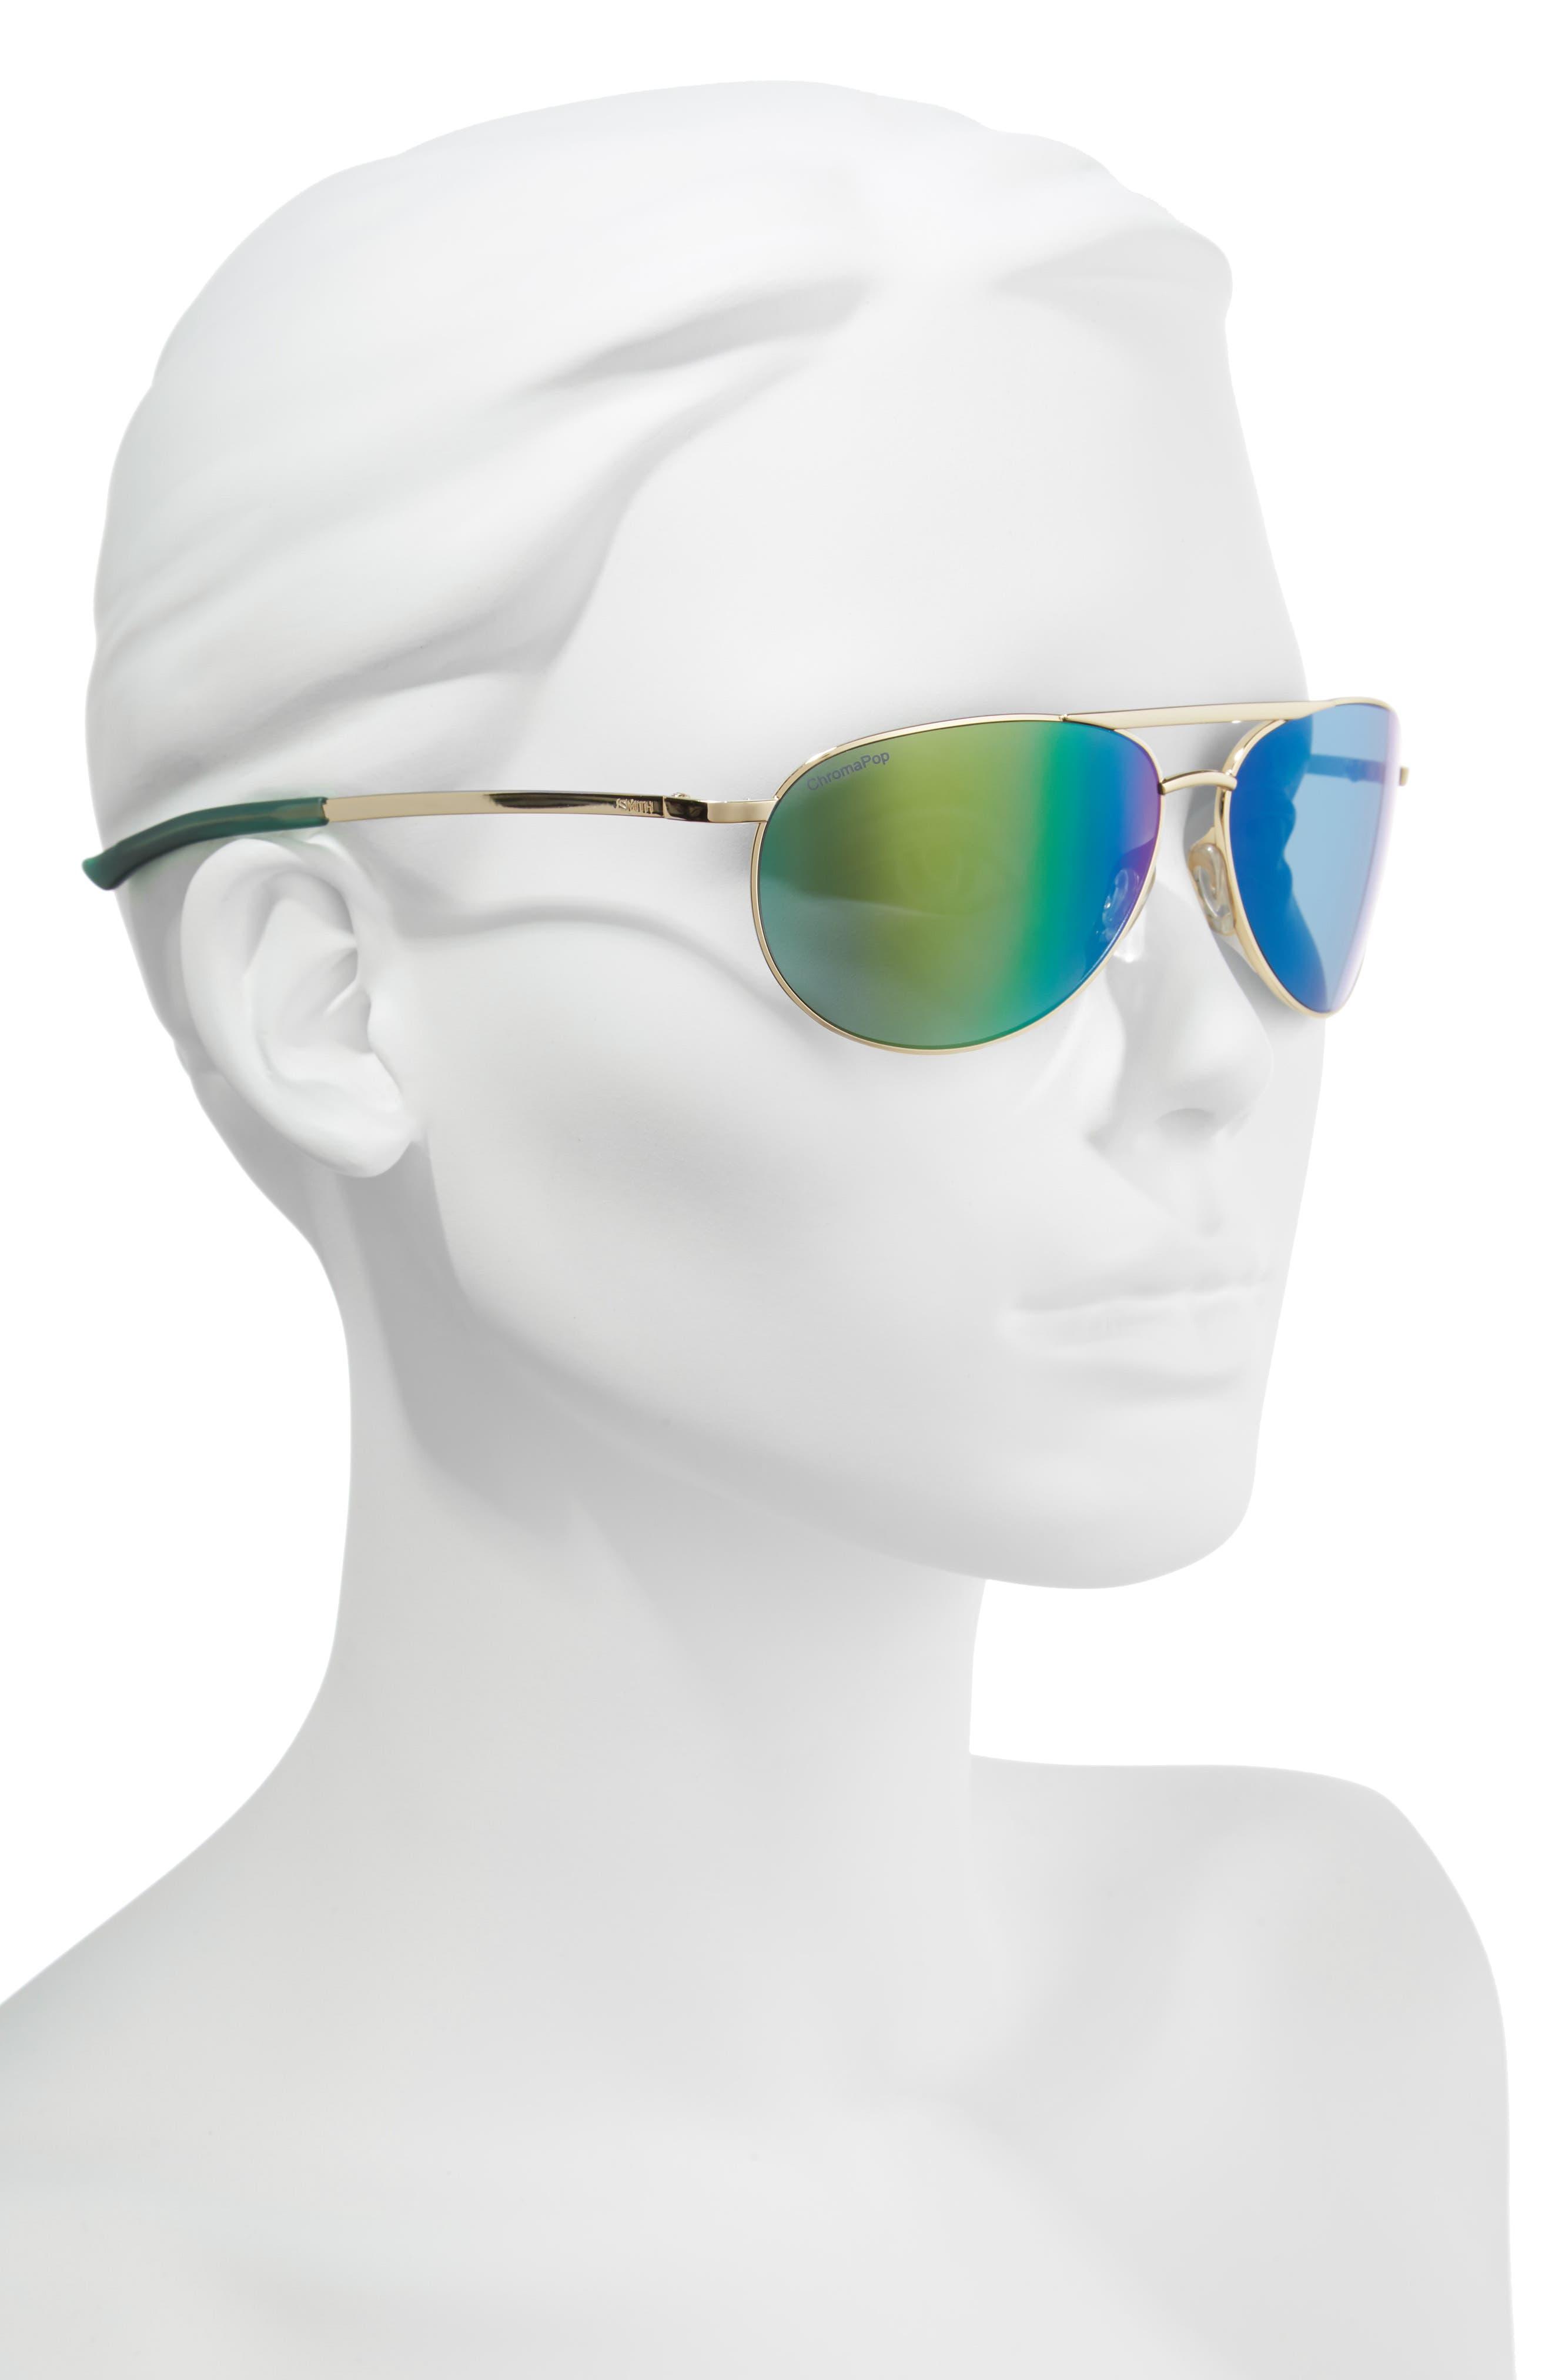 Serpico Slim 2.0 60mm ChromaPop Polarized Aviator Sunglasses,                             Alternate thumbnail 2, color,                             Gold/ Green Mirror